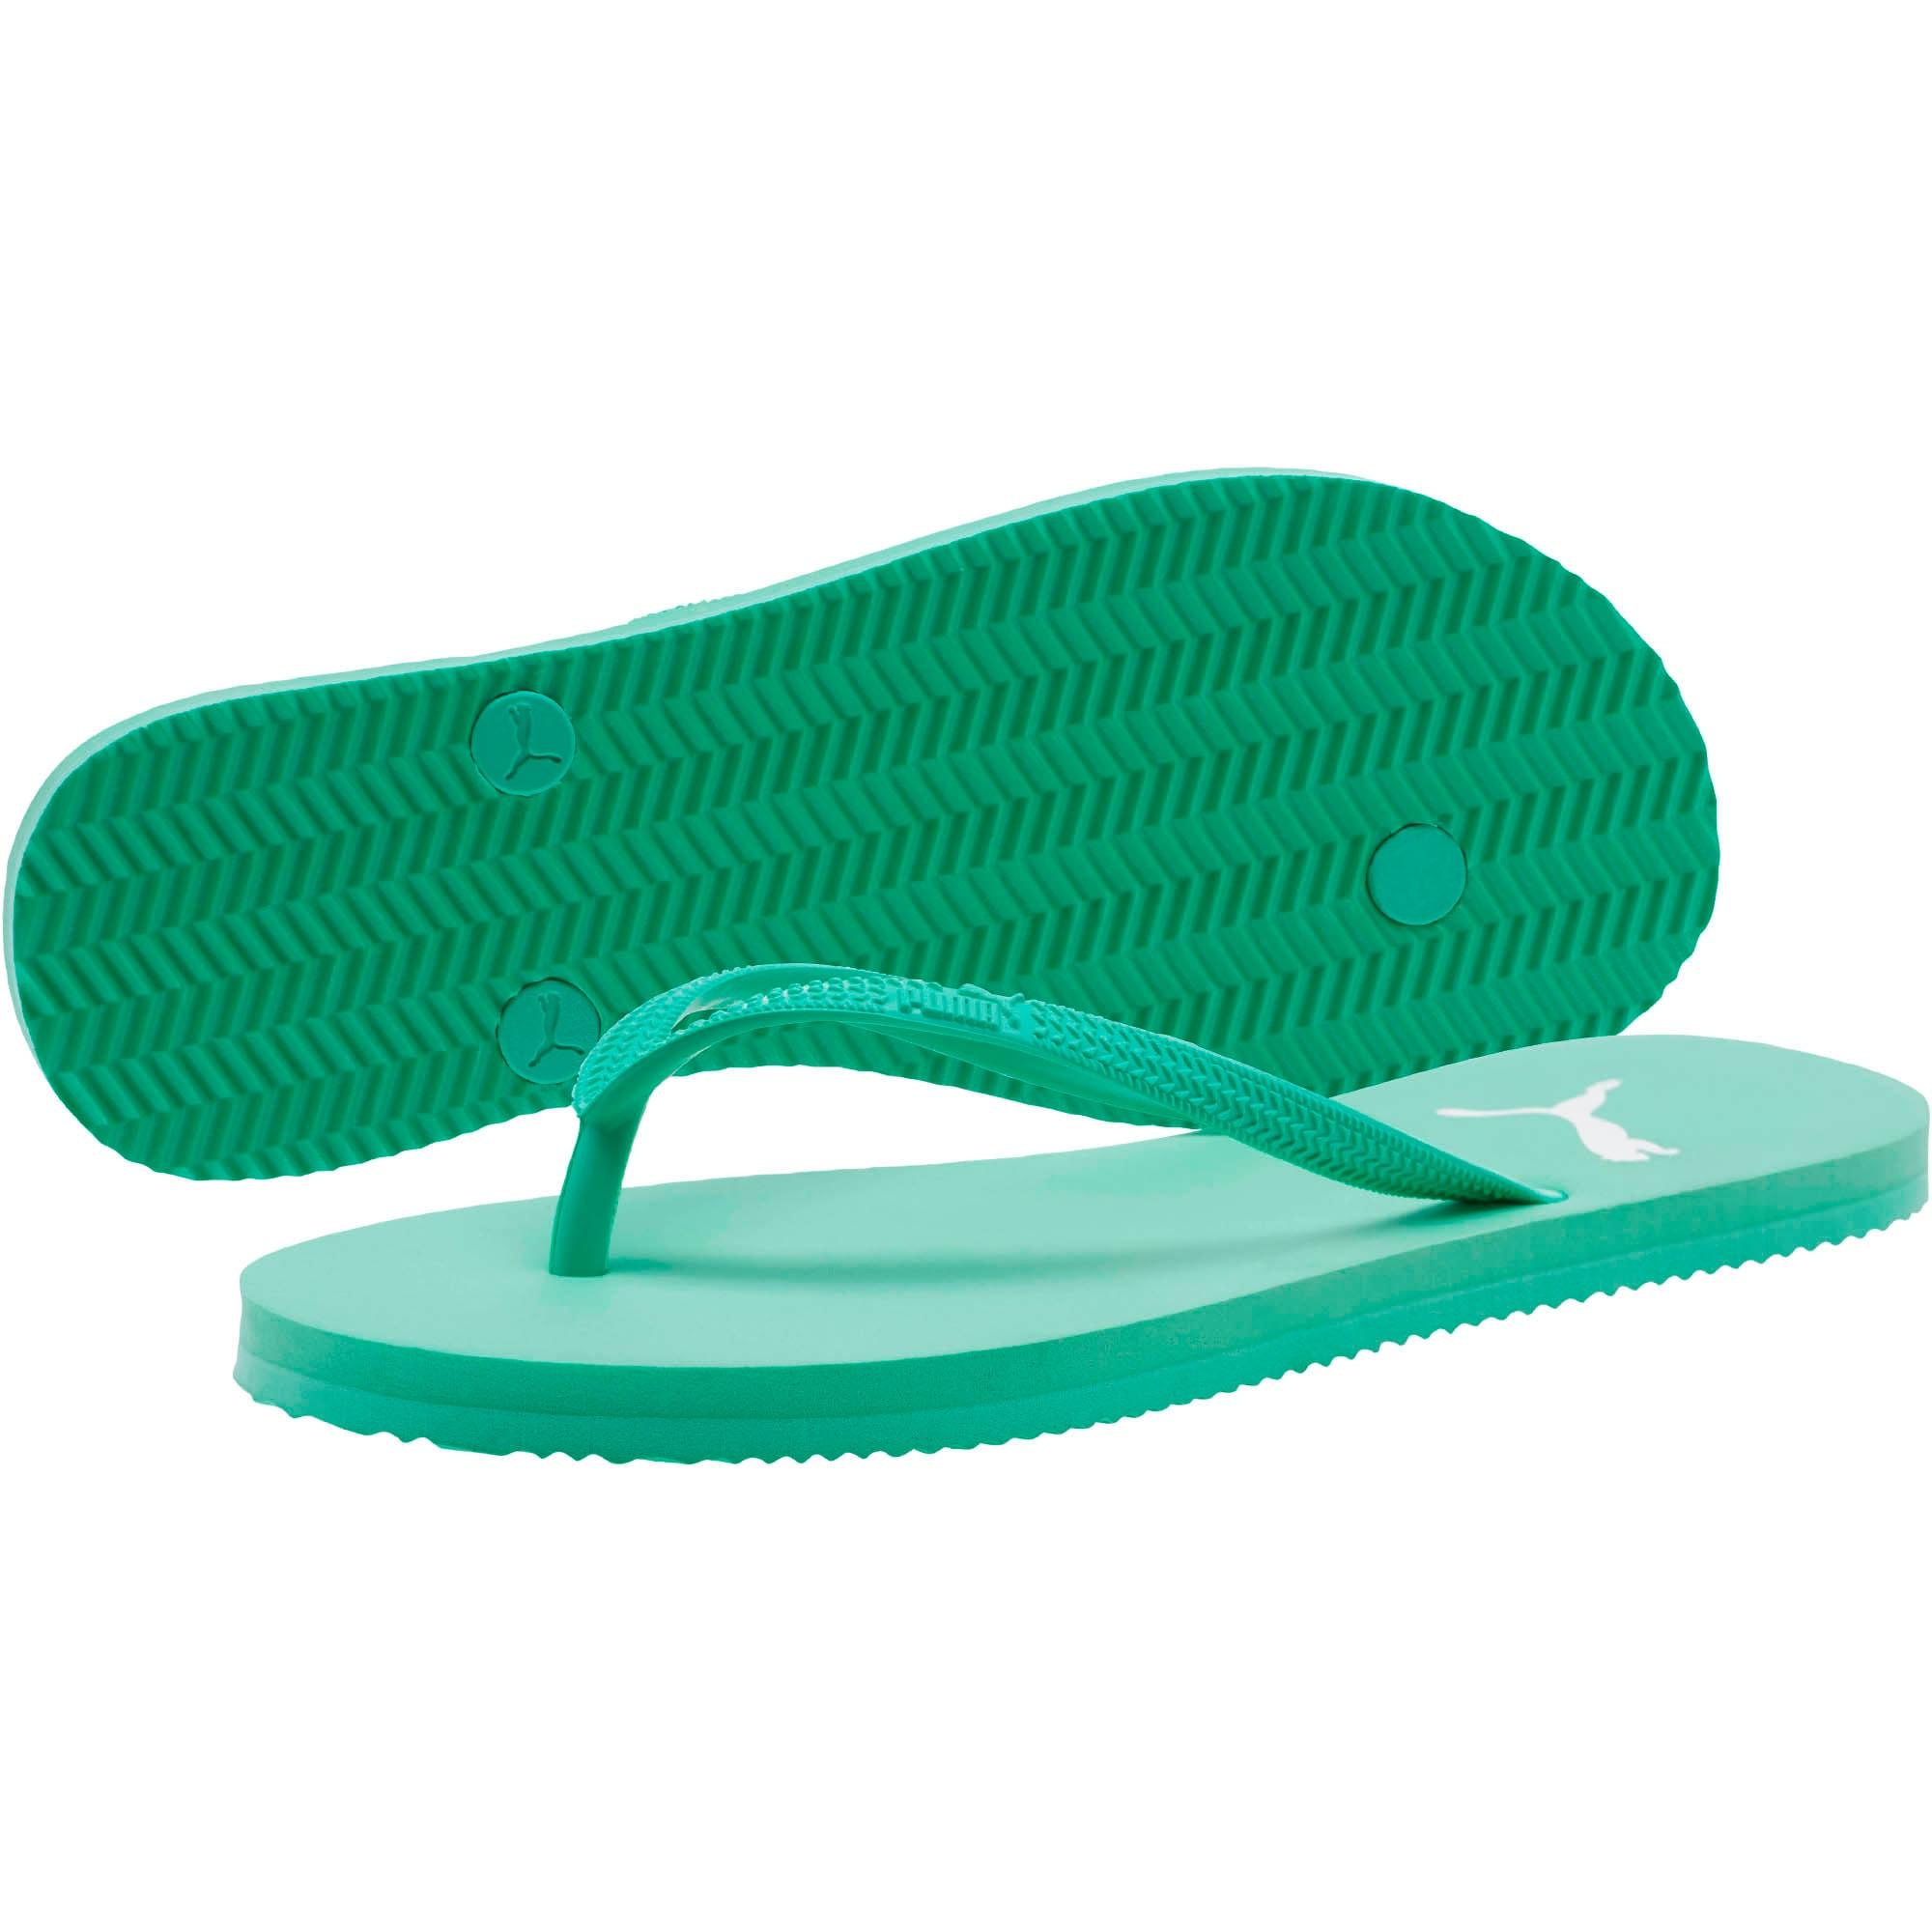 Miniatura 2 de Sandalias First Flip para mujer, Biscay Green-Puma White, mediano